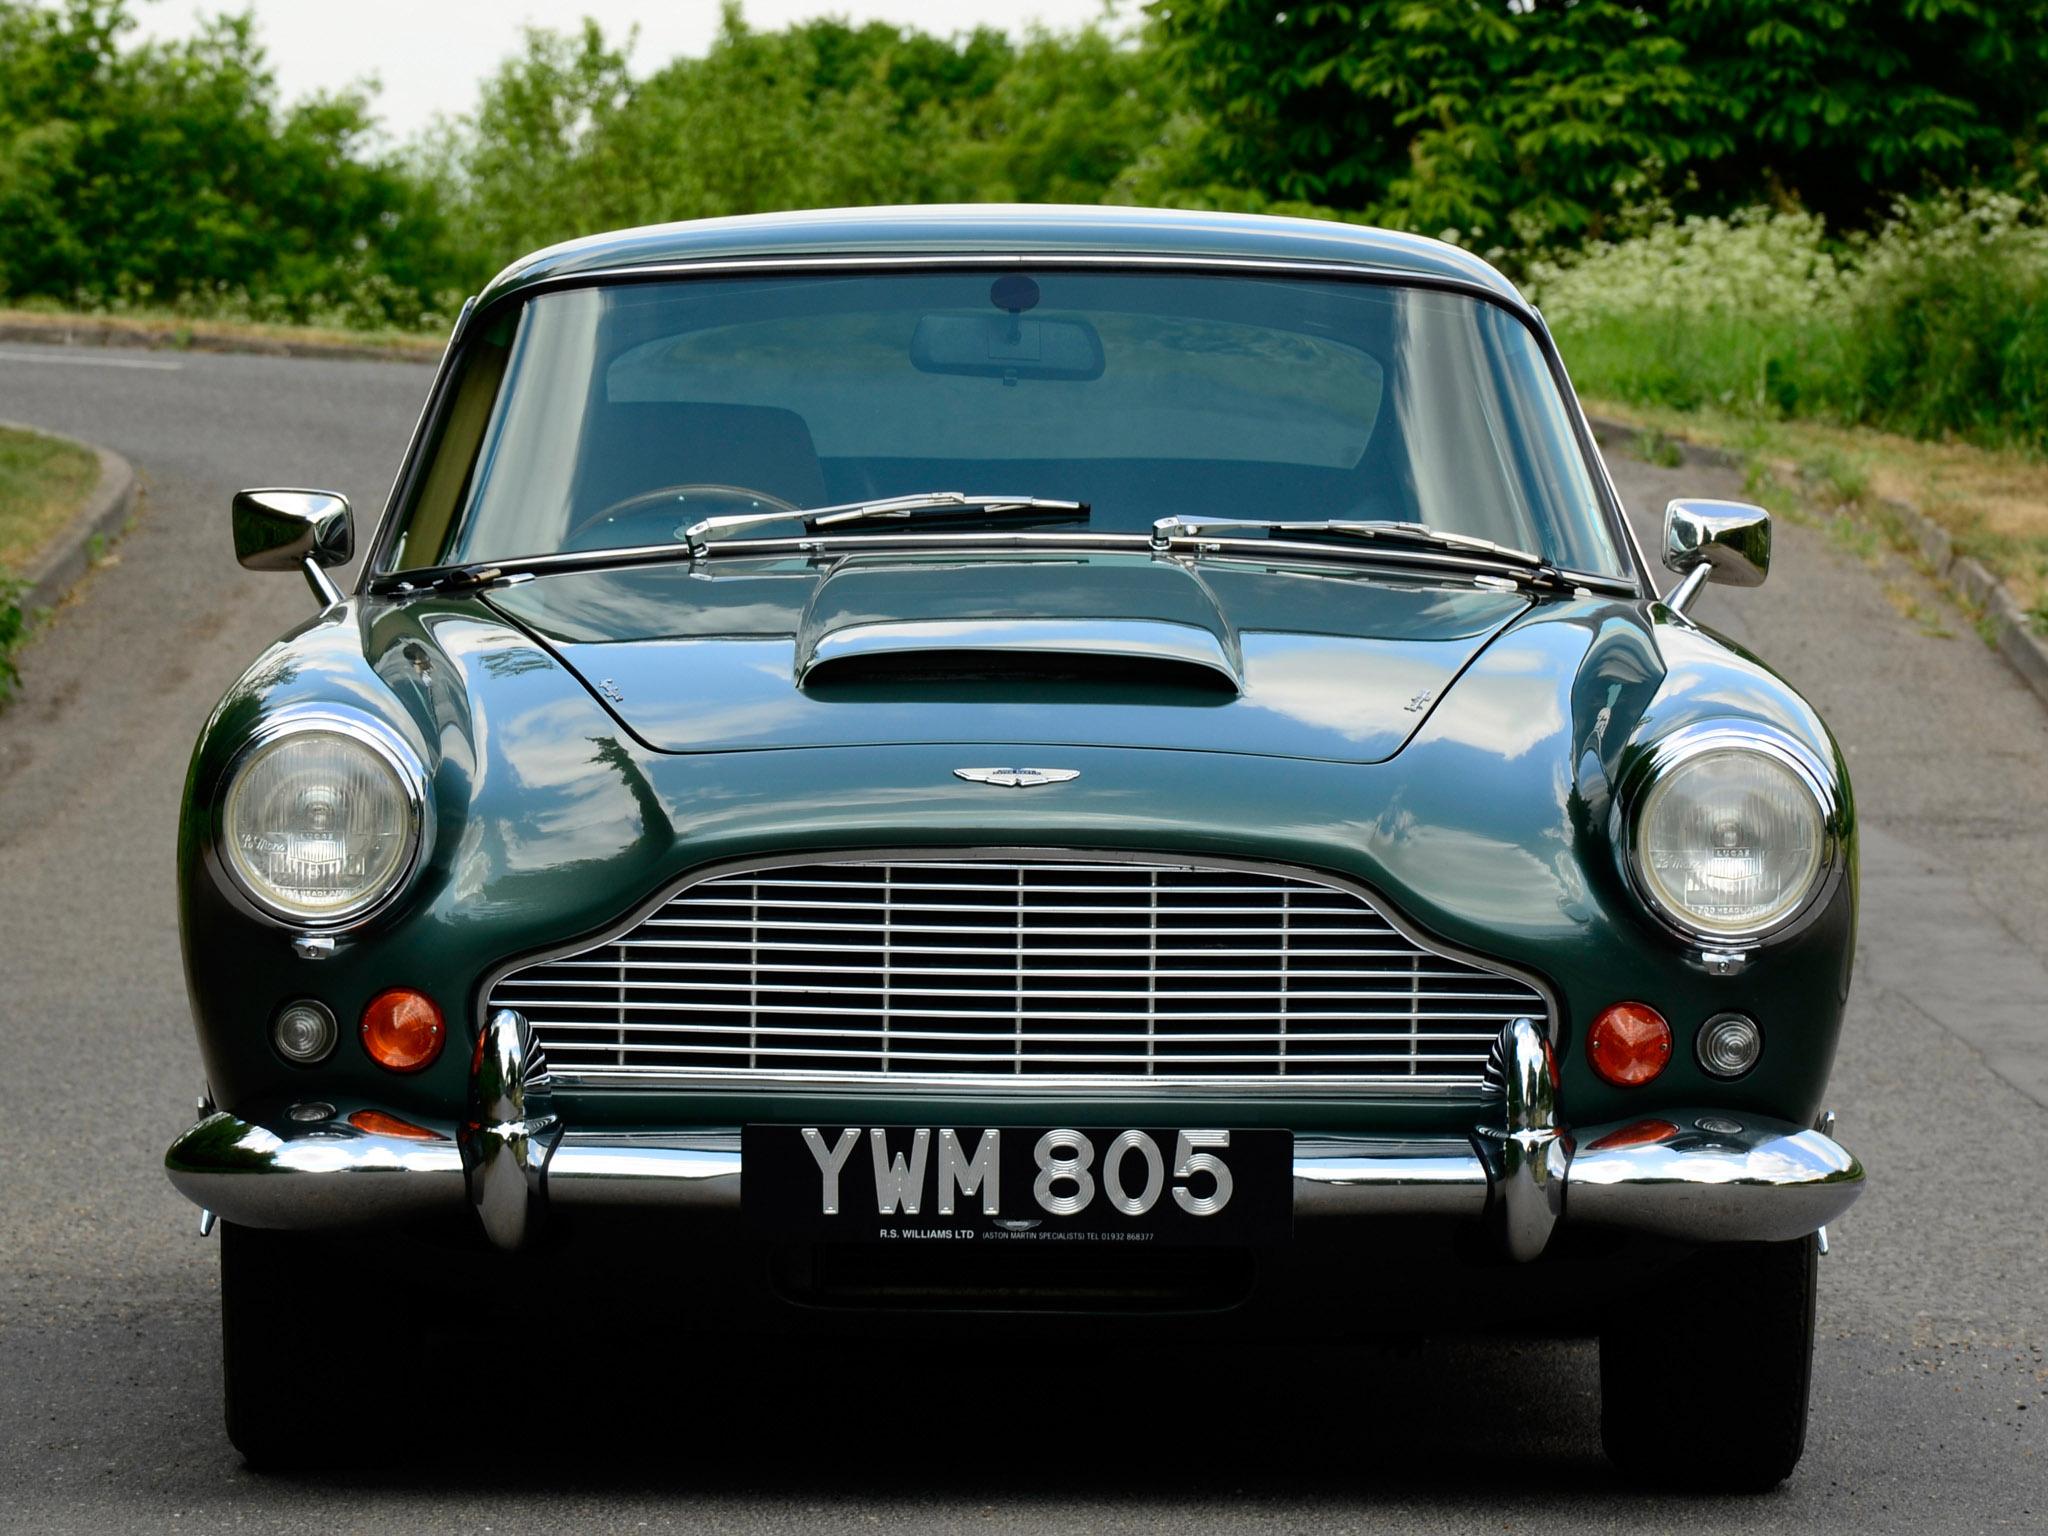 Aston Martin Db4 Uk Spec Wallpapers Car Wallpapers Hd - 1964 aston martin db4 series iv classic d wallpaper 2048x1536 104305 wallpaperup